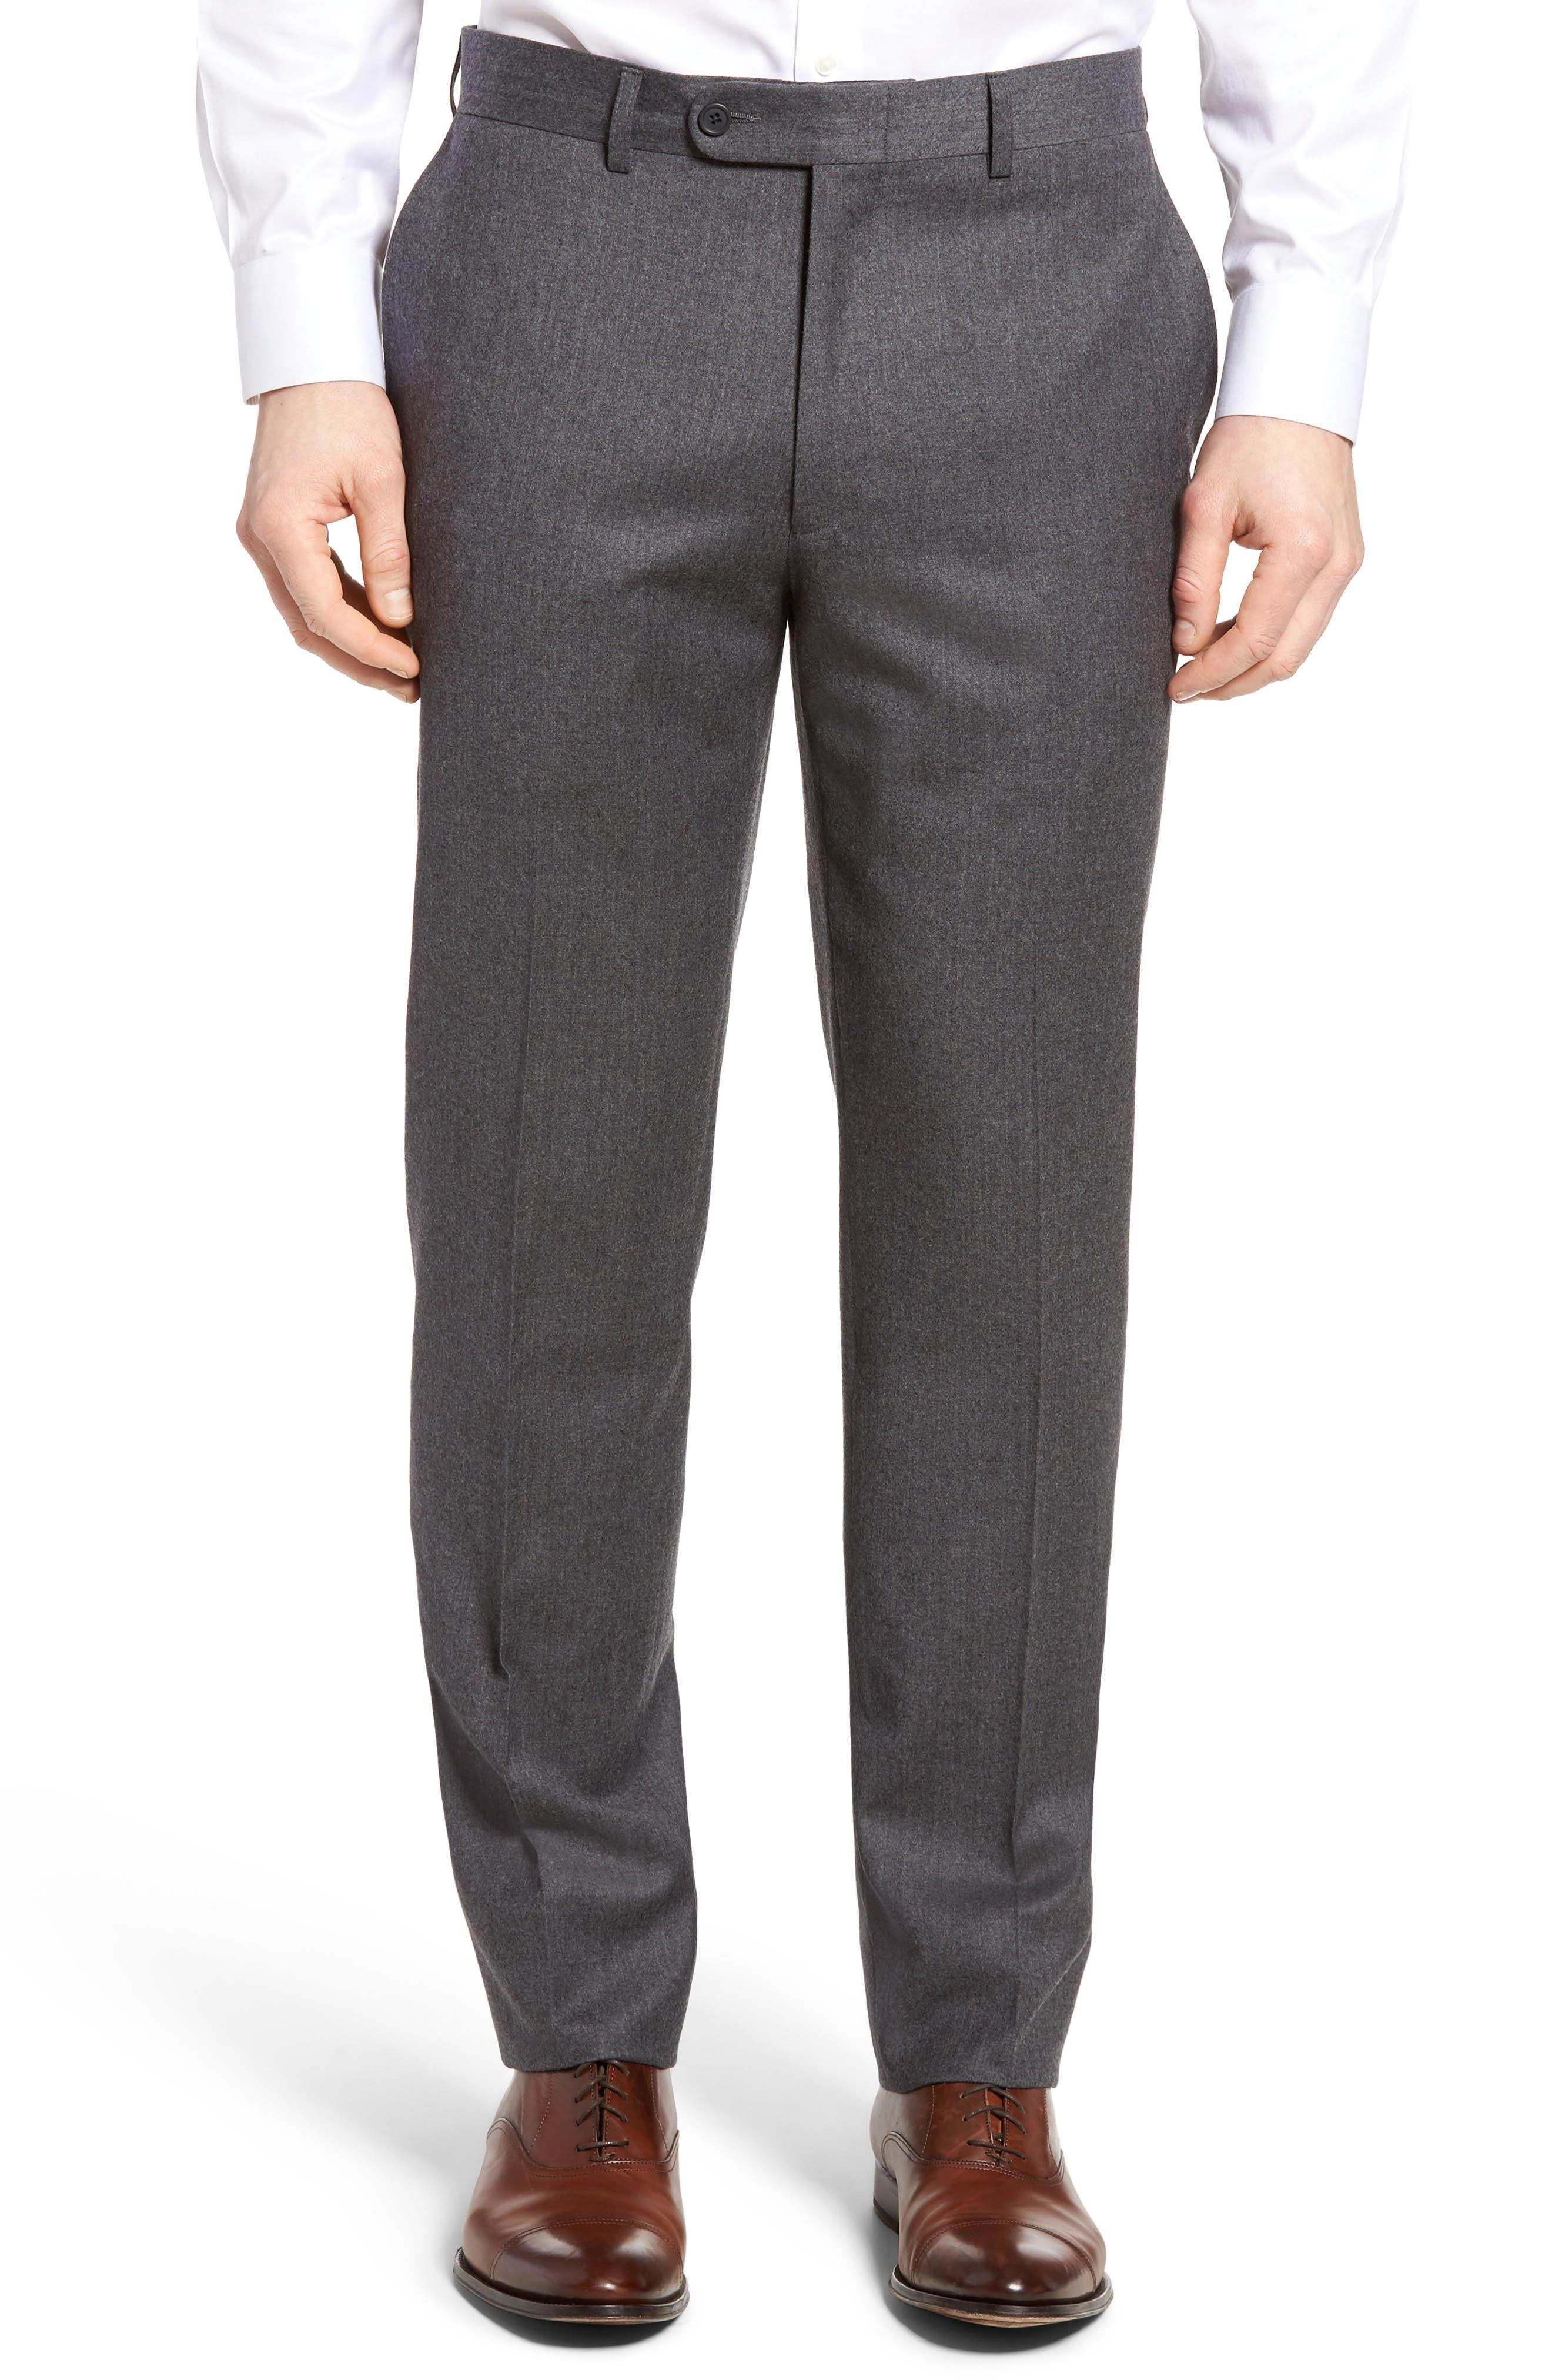 Bensol Flannel Wool Trousers (Regular & Big)